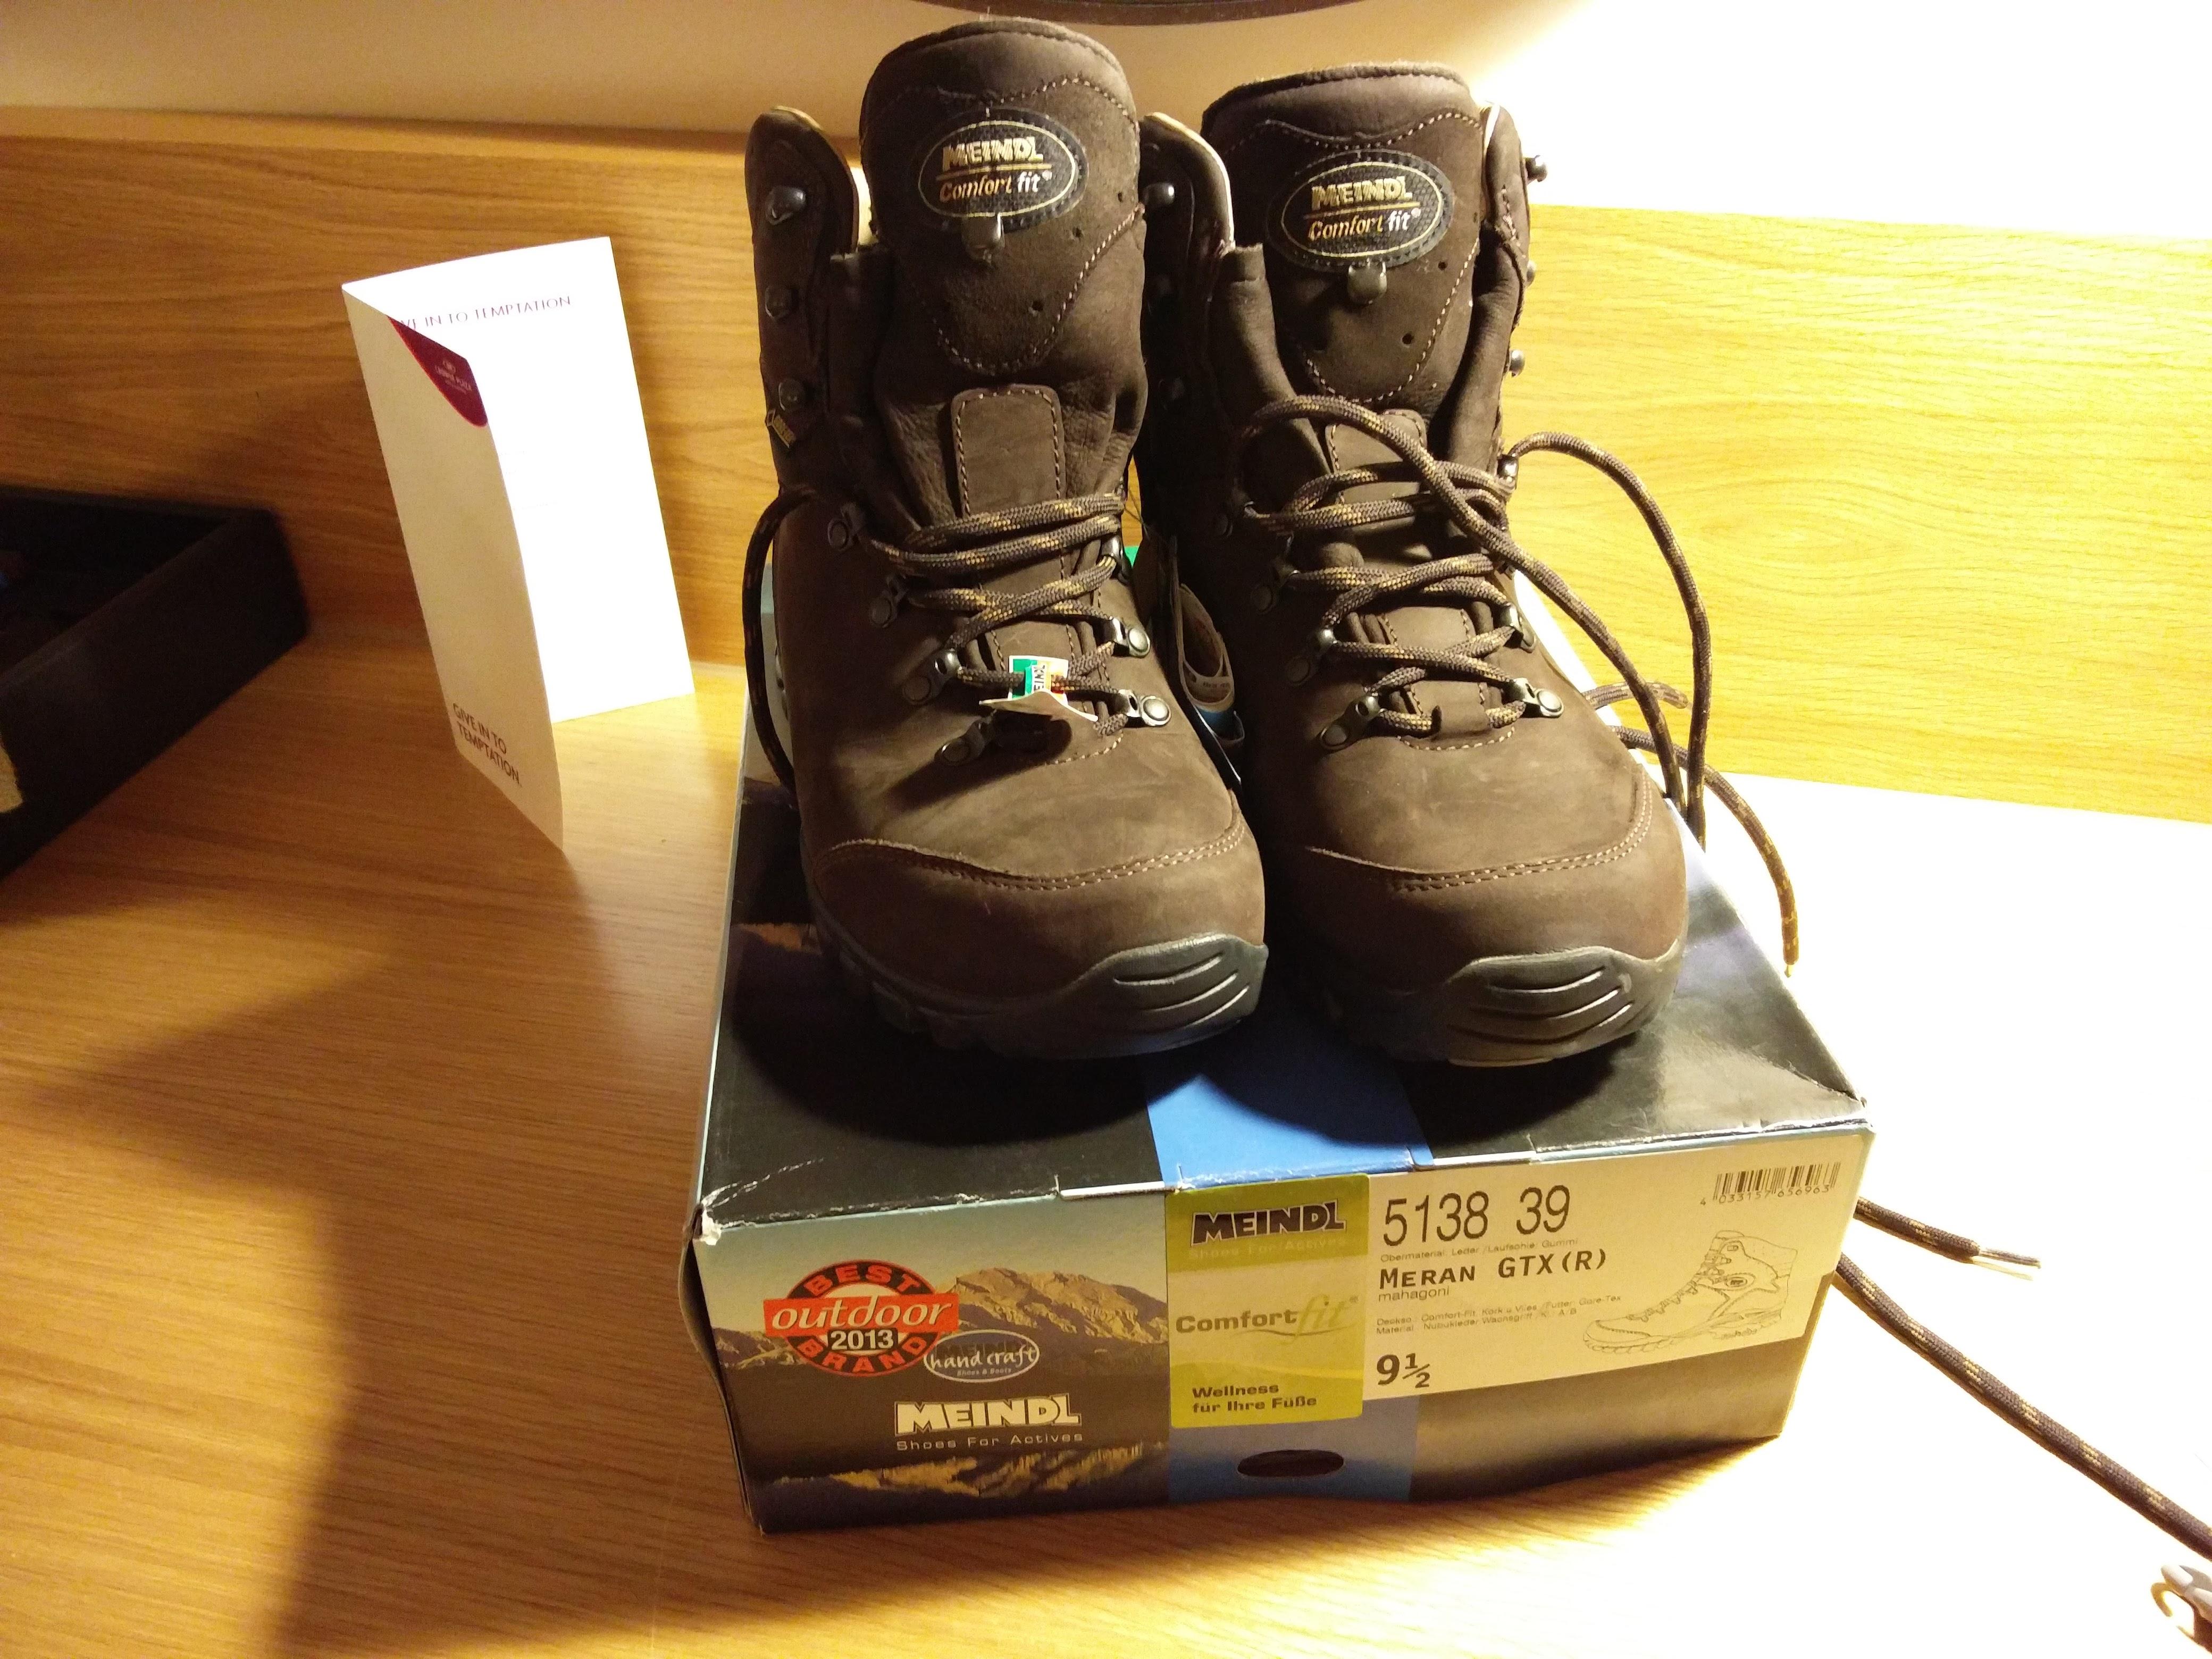 coast to coast walk preparation - my meindl boots